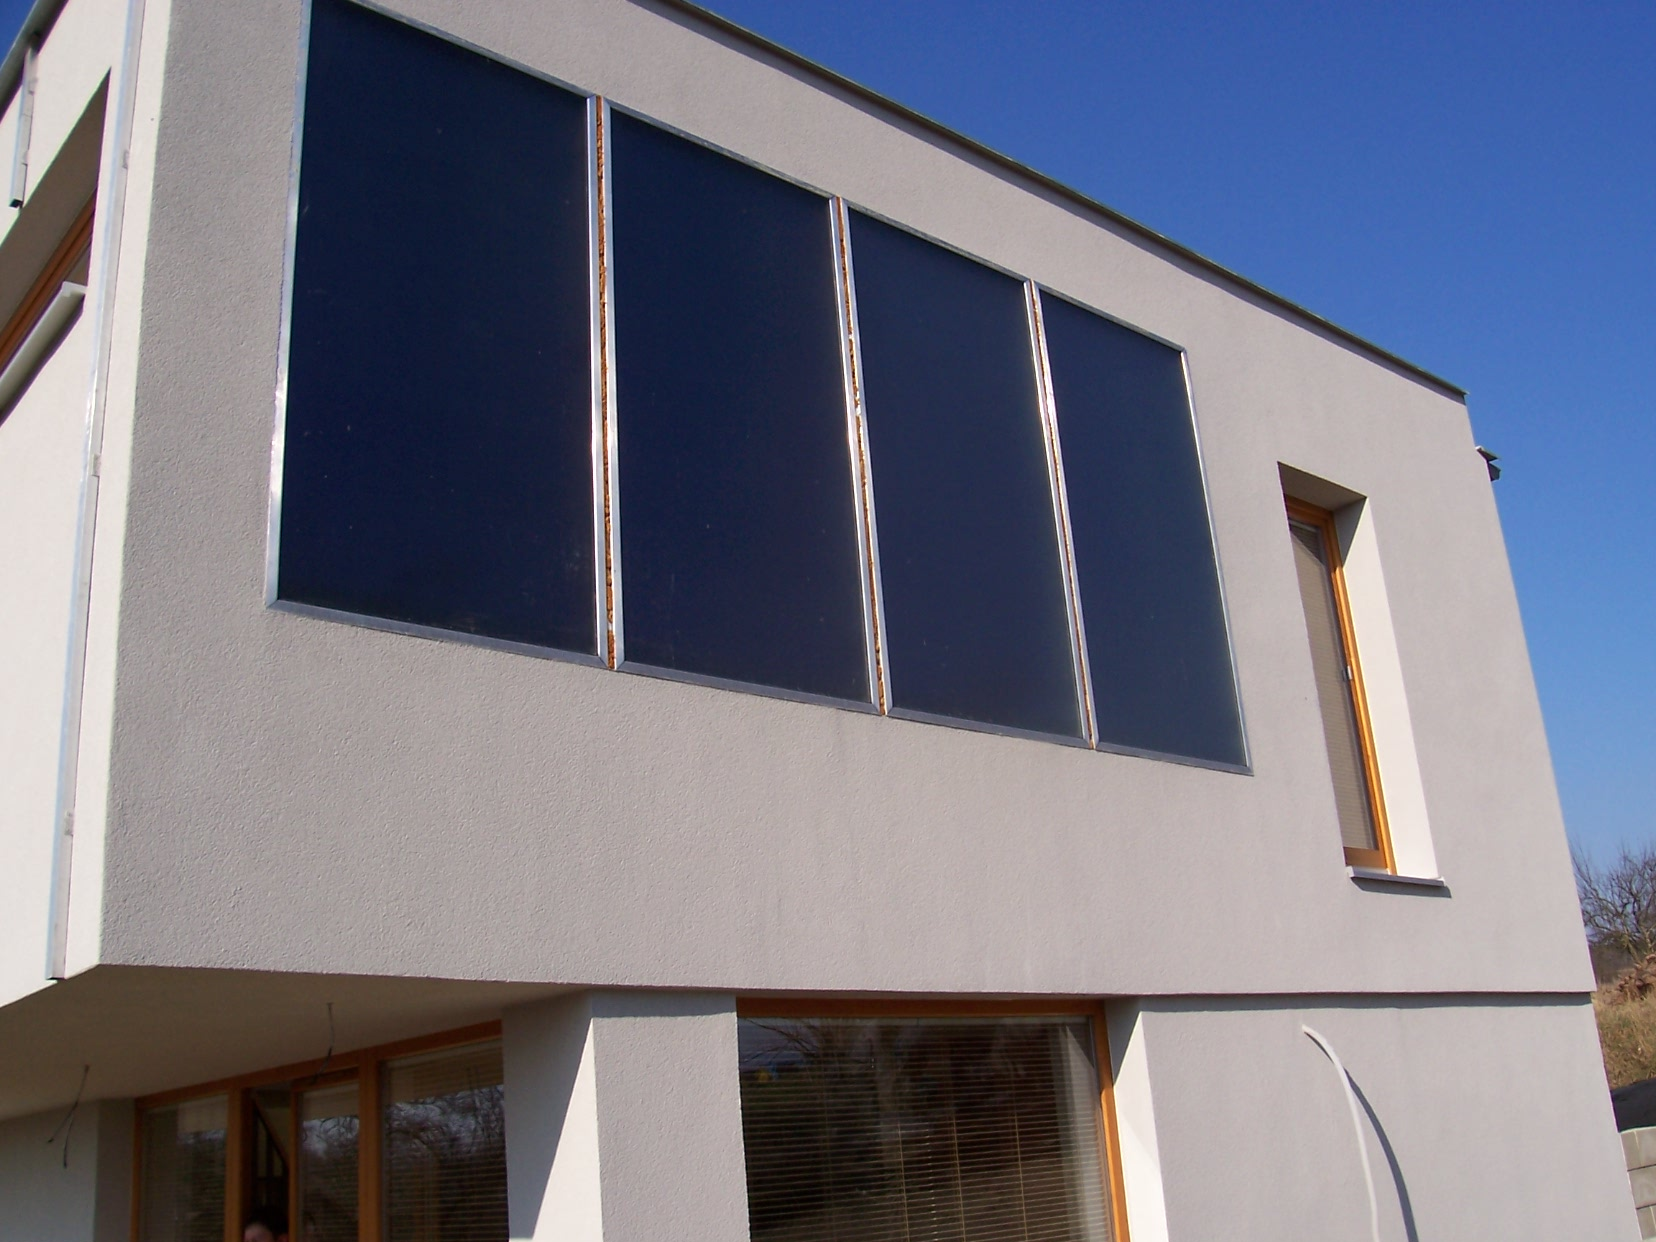 Pannelli solari verticali espertocasaclima for Pannelli solari solar